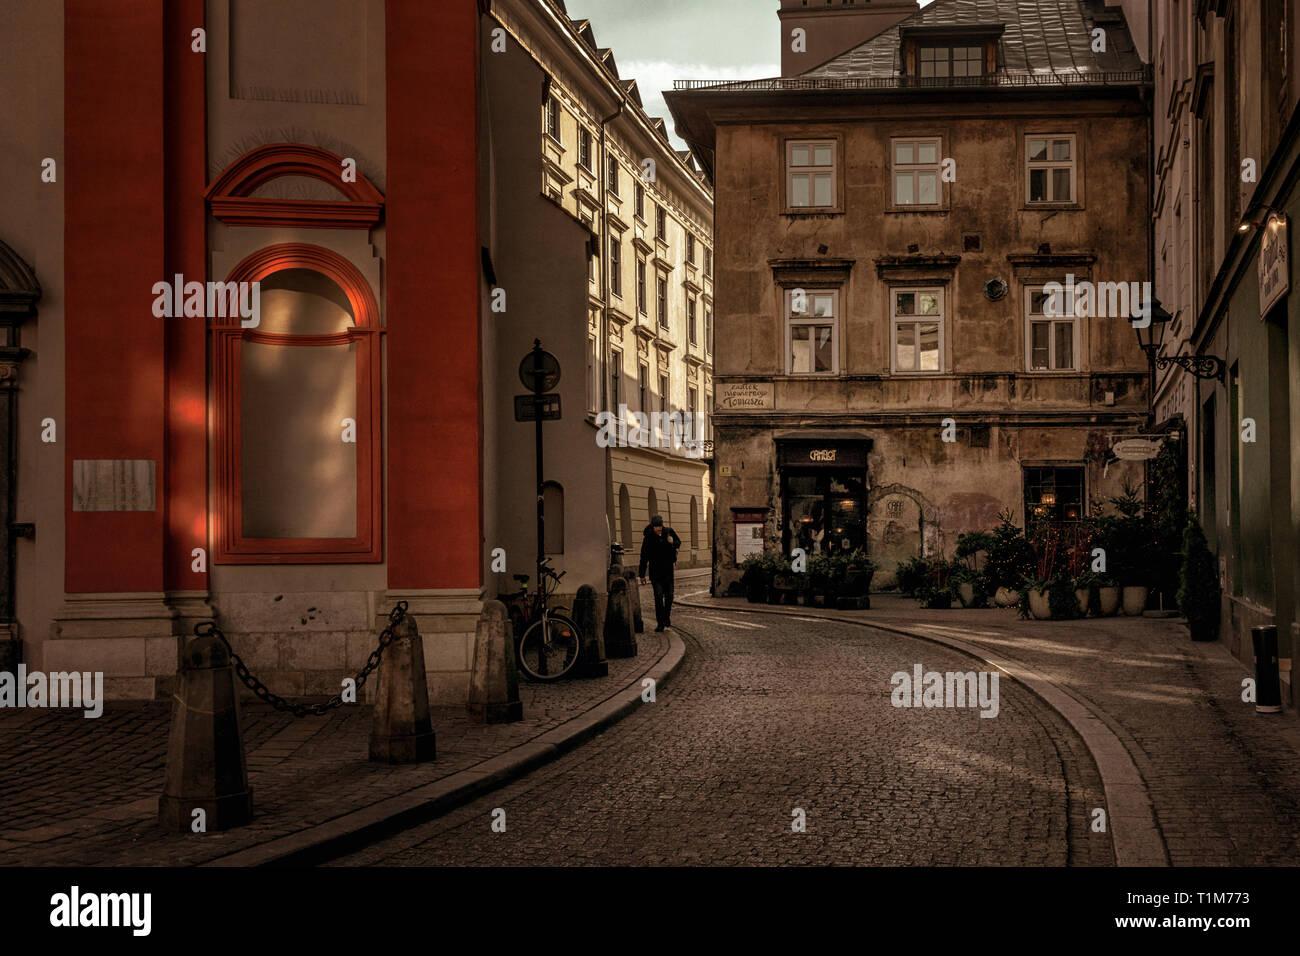 Man walking down Zautek Niewiernego Tomasza with Camelot cafe in the background, Krakow, Poland - Stock Image